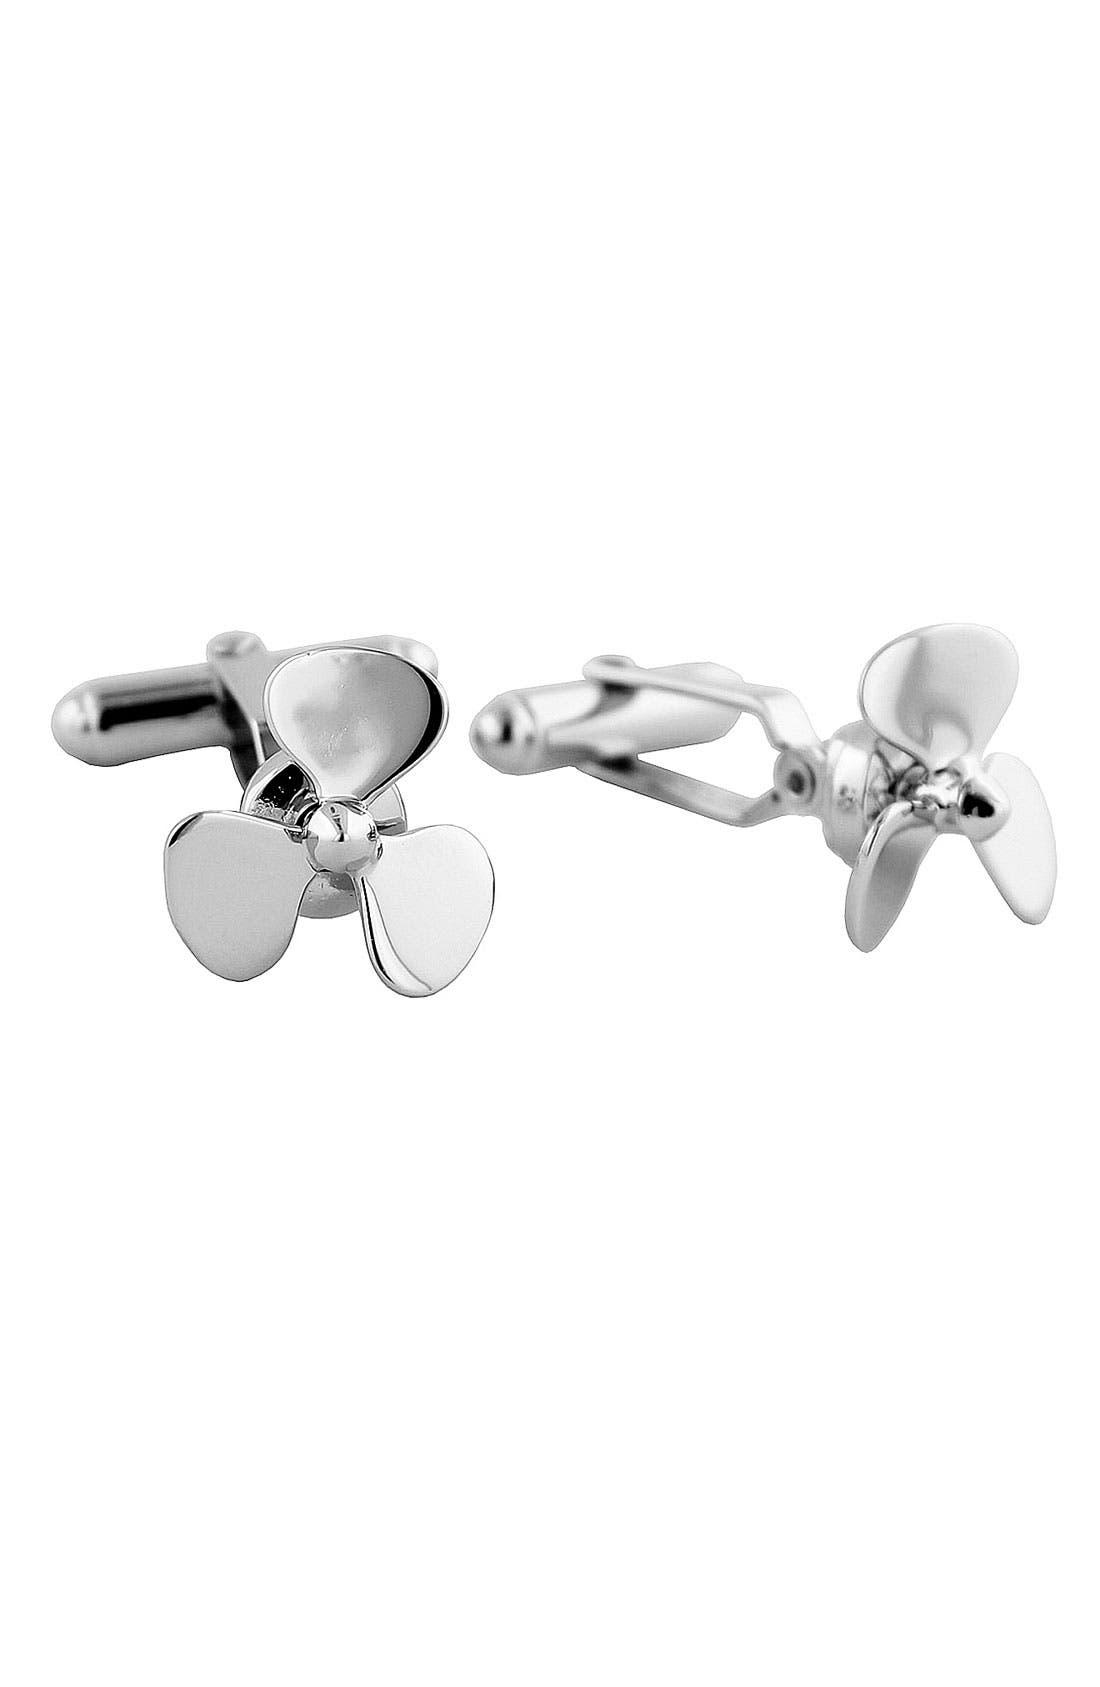 Alternate Image 1 Selected - David Donahue 'Propeller' Cuff Links